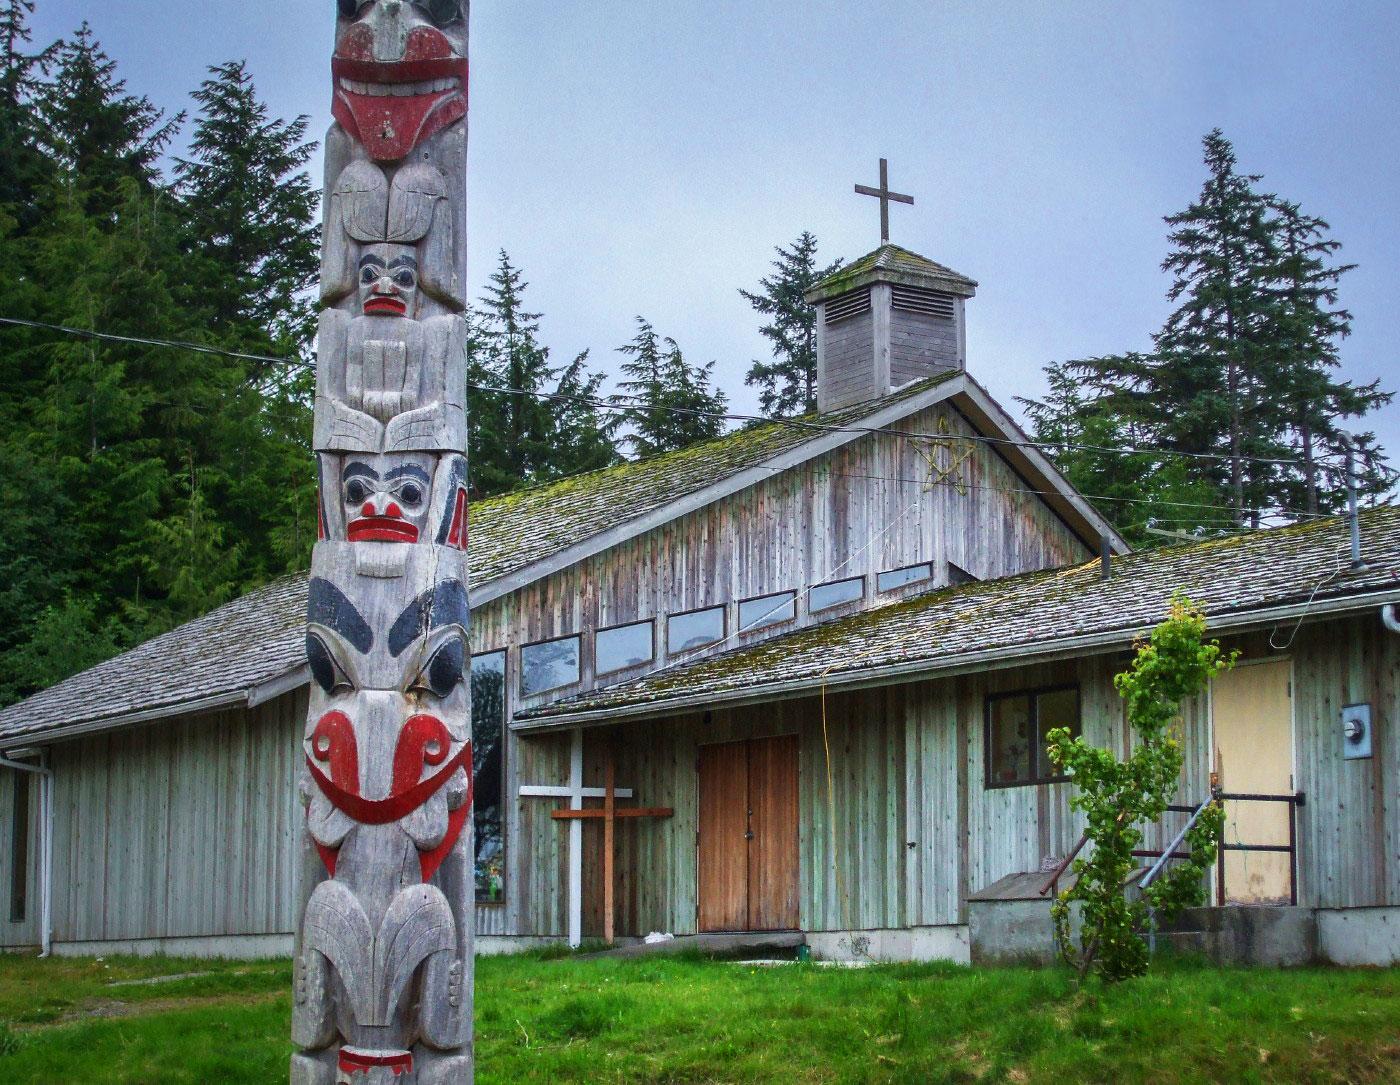 Church in Masset, Haida Gwaii